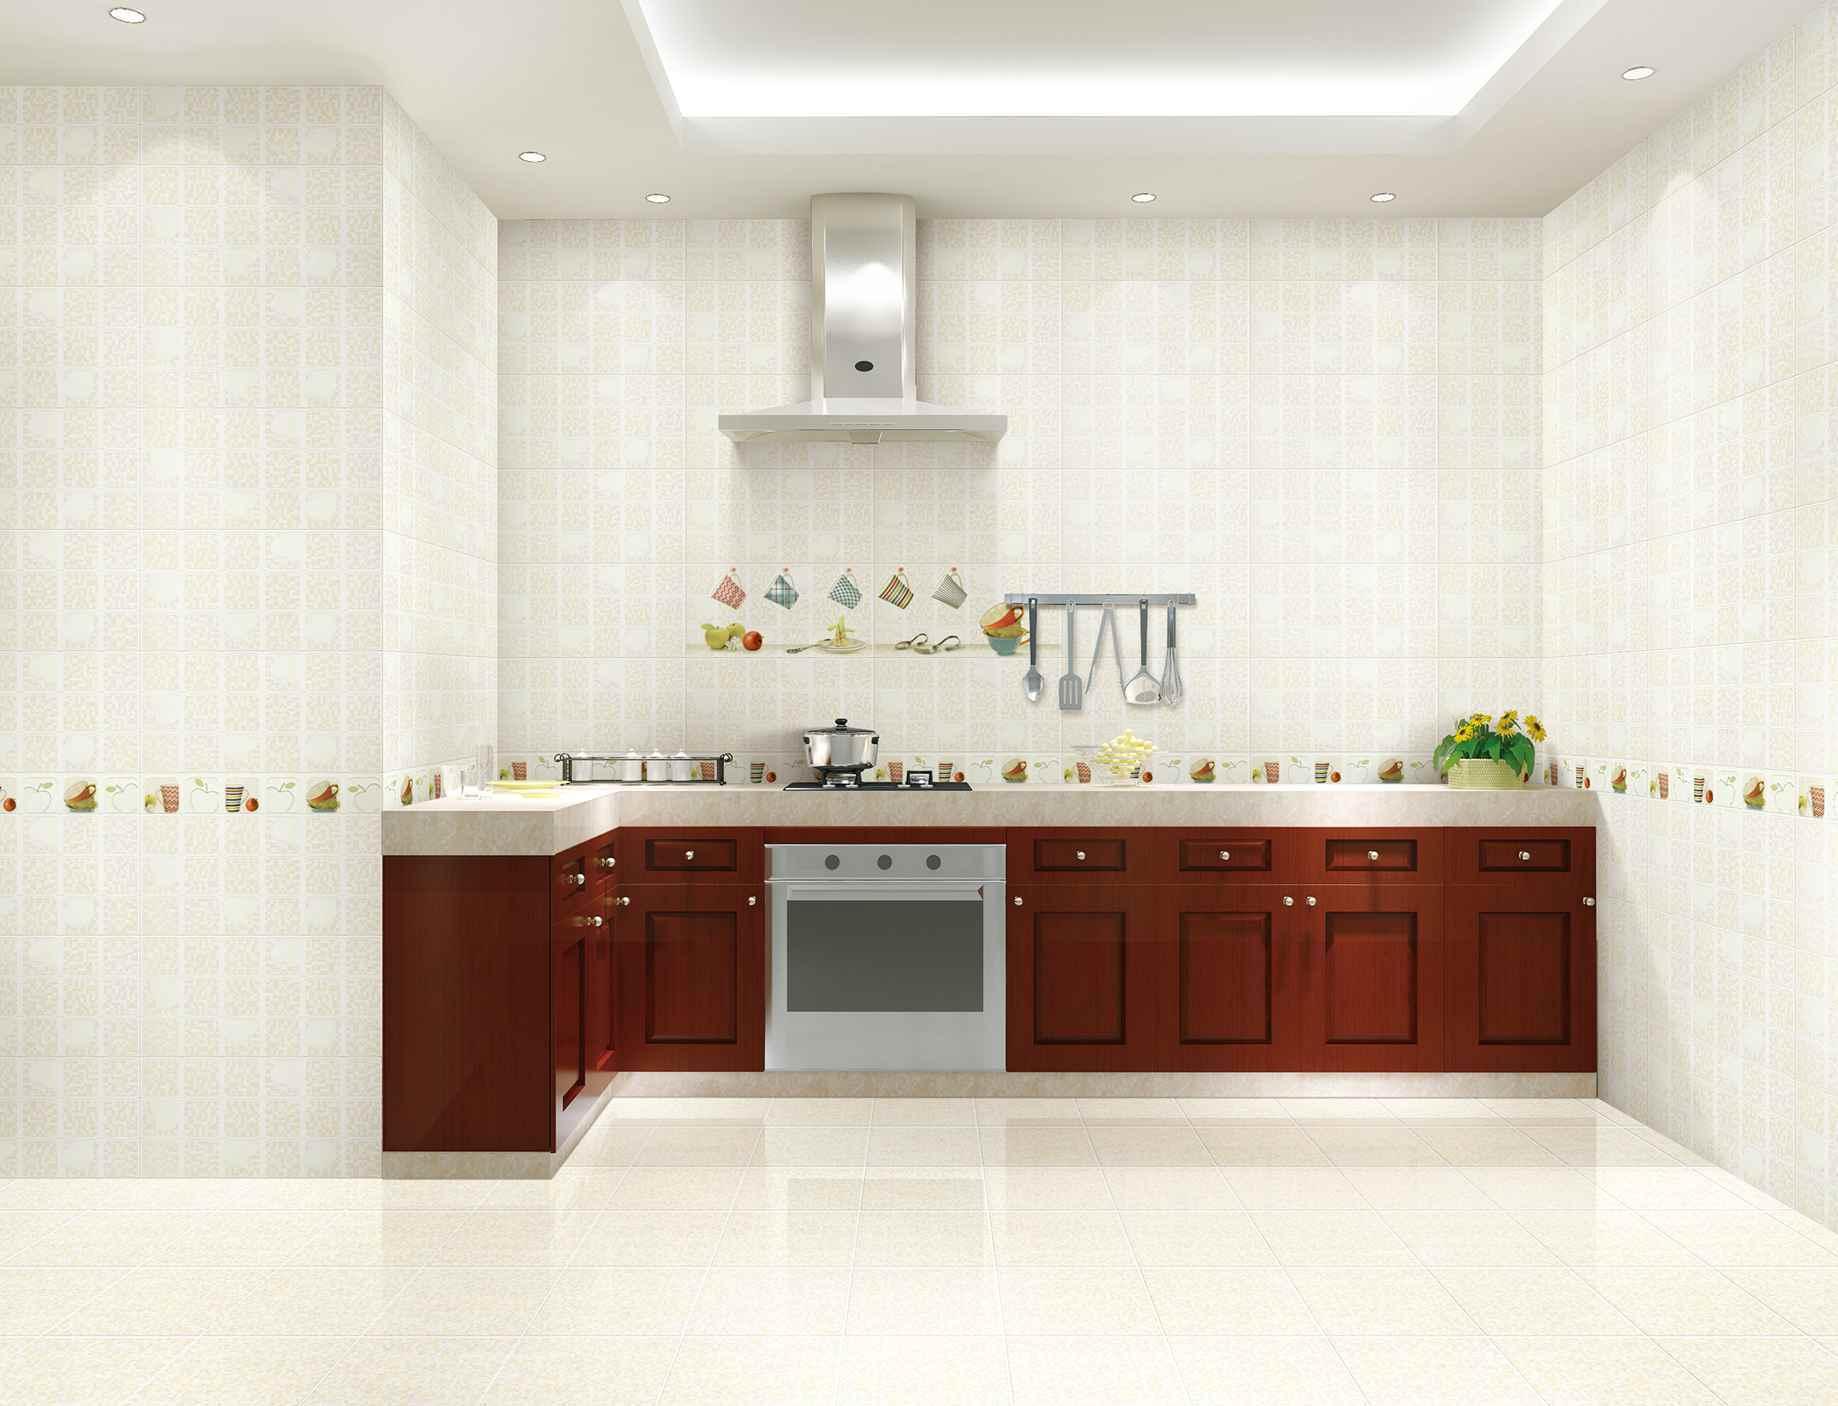 Cer mica para cocina imagui azulejos para cocinas - Precio azulejos cocina ...